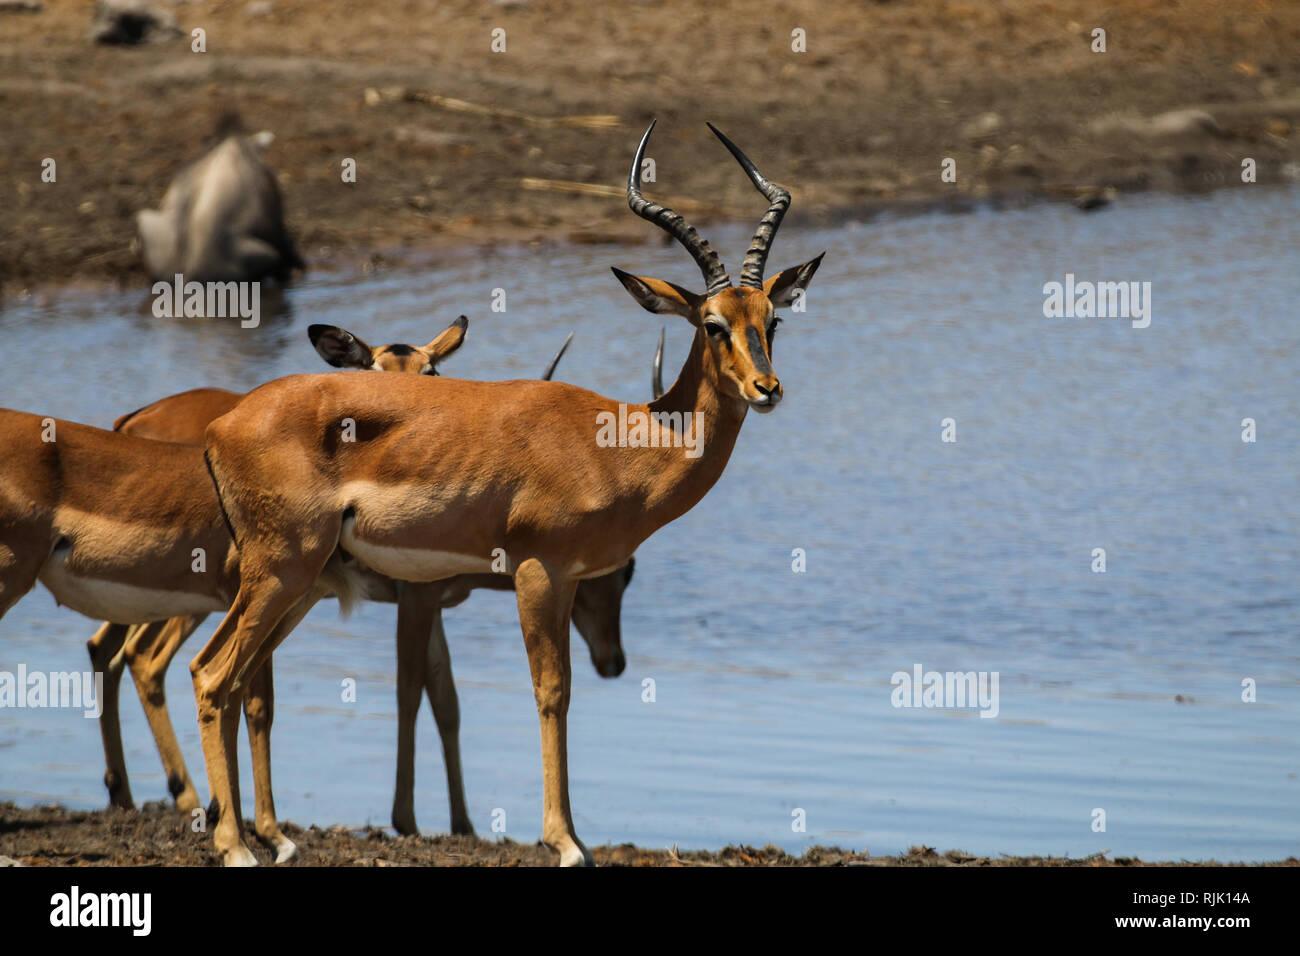 Impalas am Wasserloch in Namibia Stock Photo